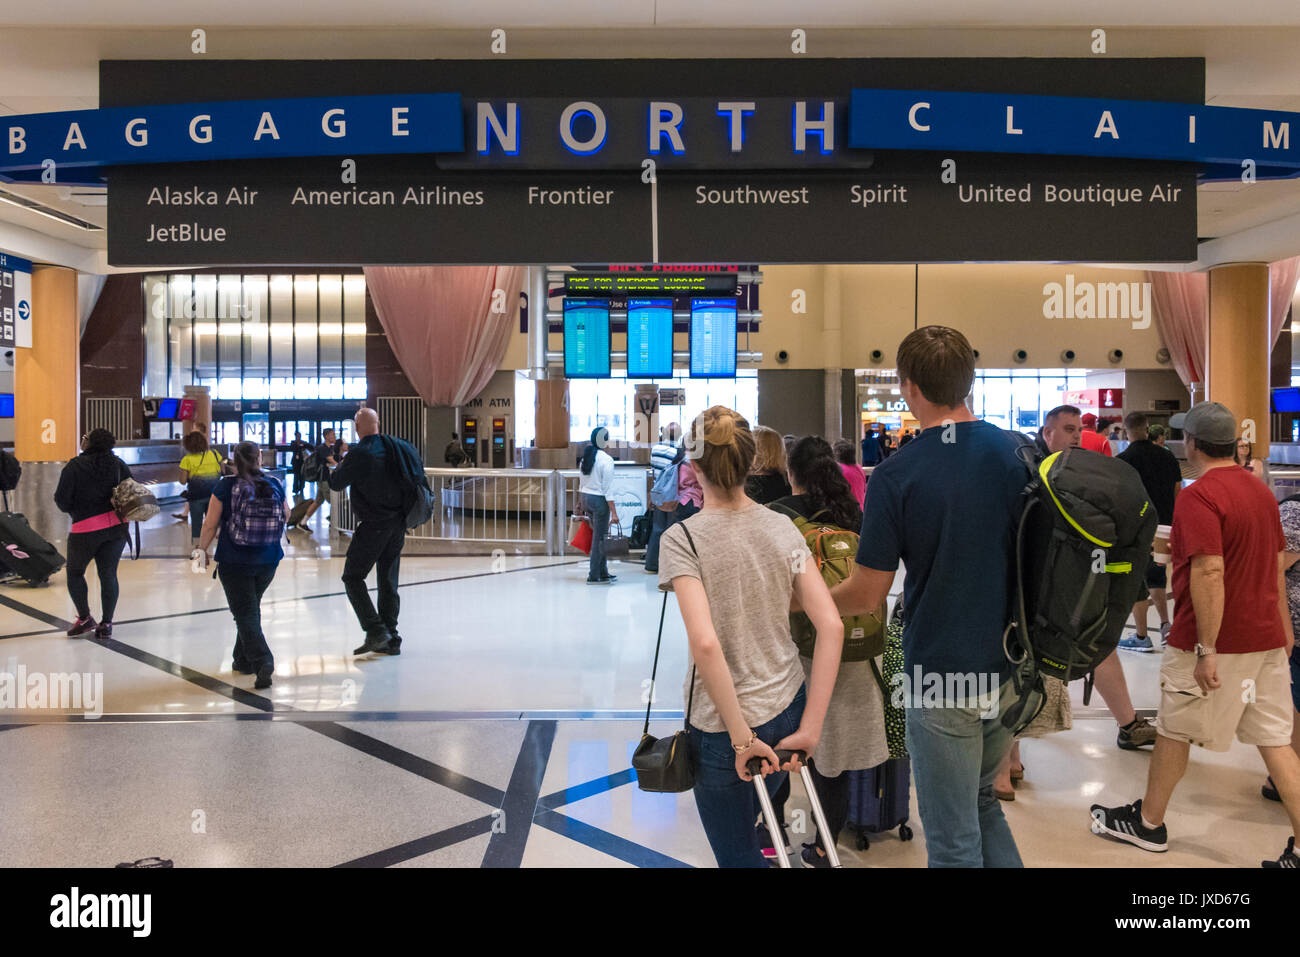 North Terminal baggage claim at Hartsfield-Jackson Atlanta International Airport, the world's busiest airport, in Atlanta, Georgia, USA. - Stock Image